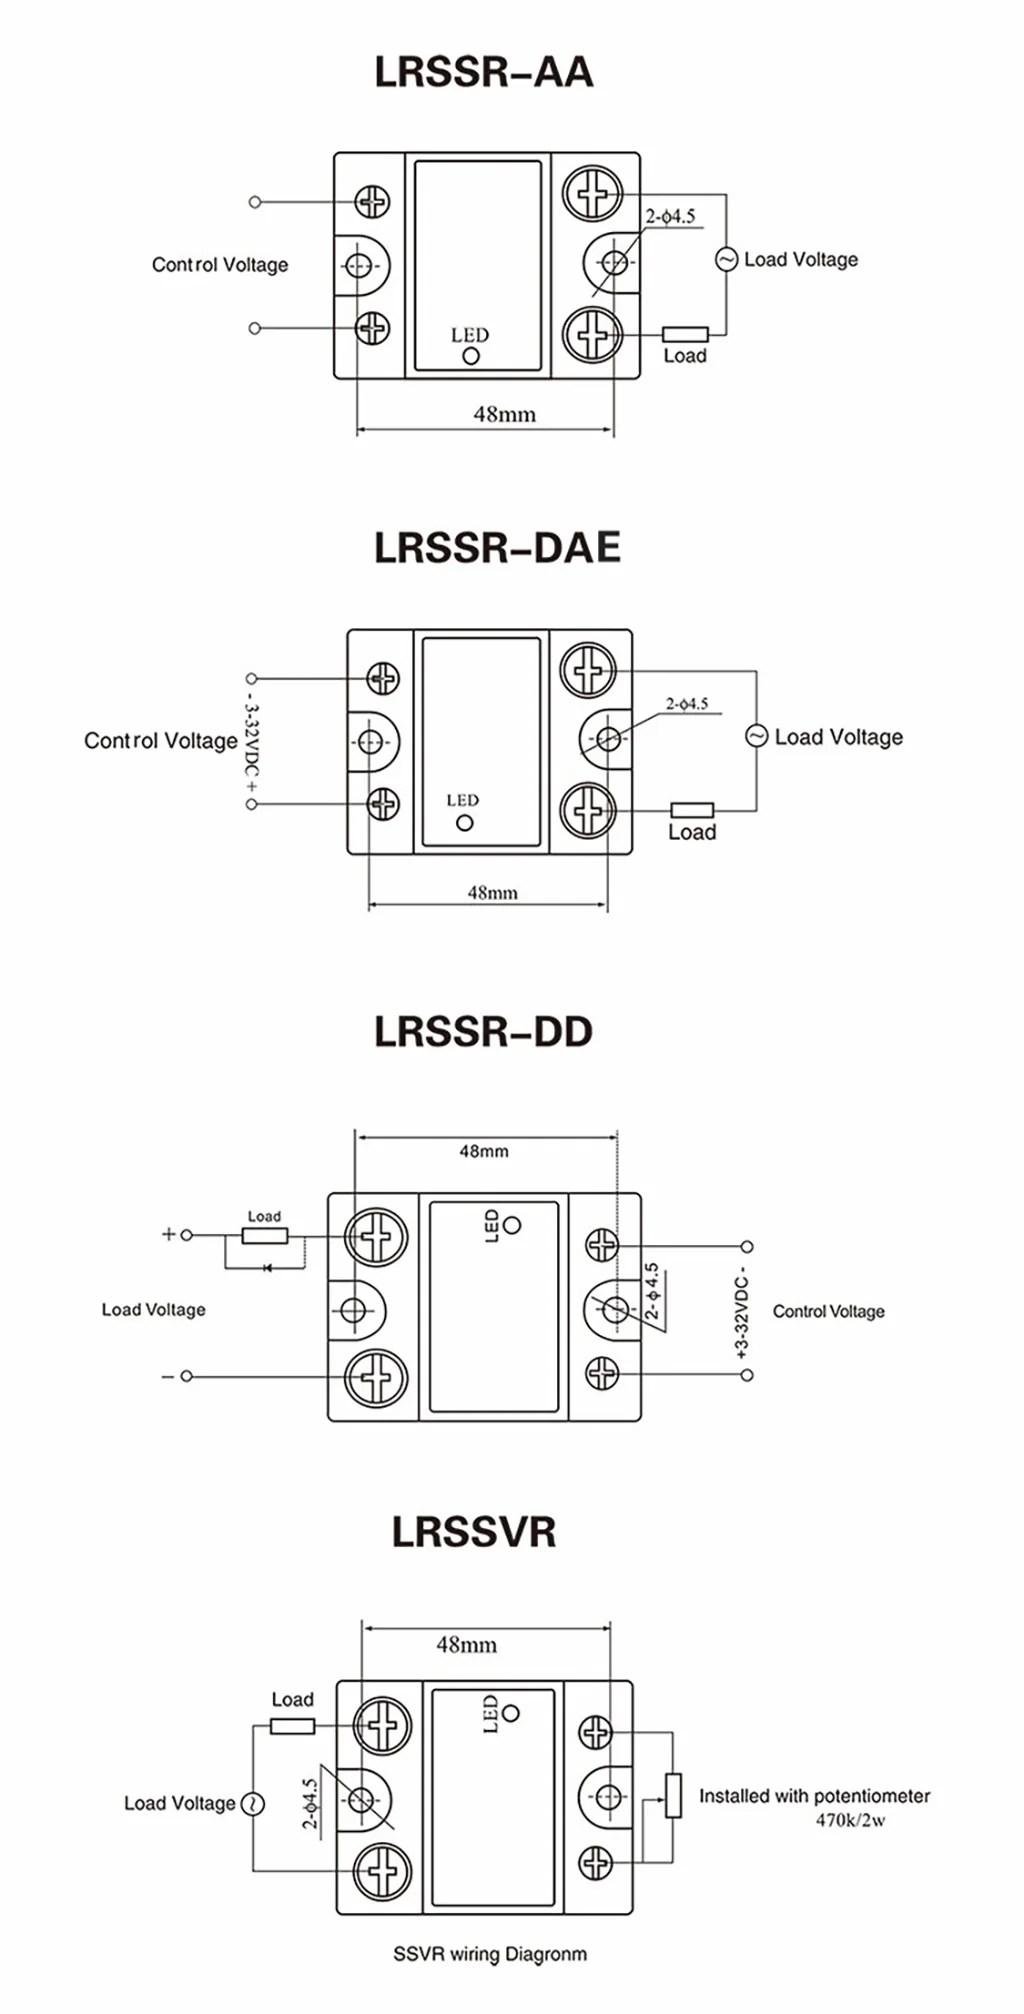 connecting diagram lrssr [ 1024 x 2014 Pixel ]